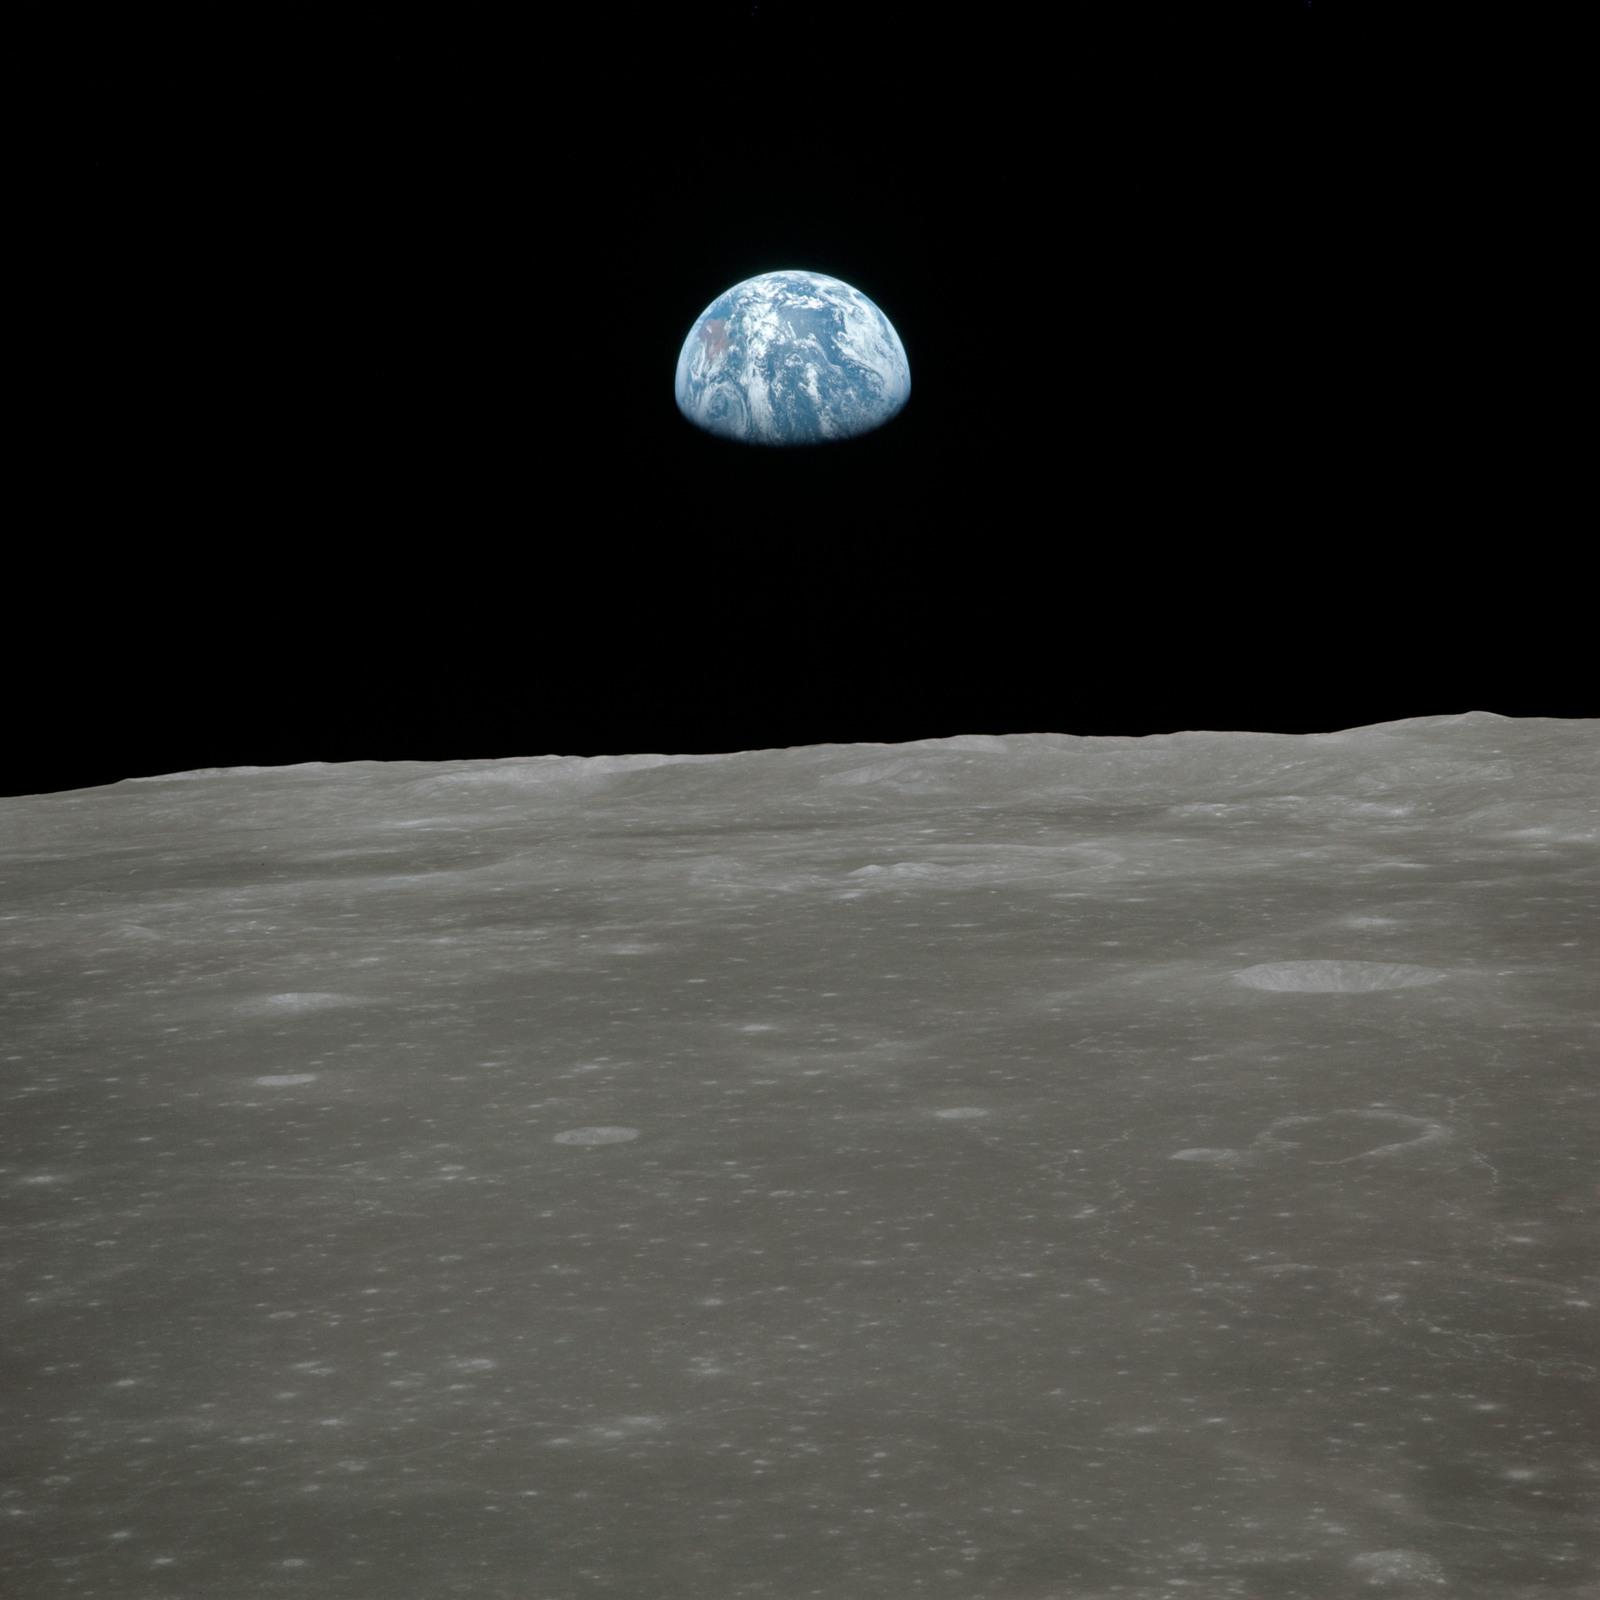 AS11-44-6557 - Apollo 11 - Apollo 11 Mission image - View of moon limb, with Earth on the horizon, Mare Smythii Region